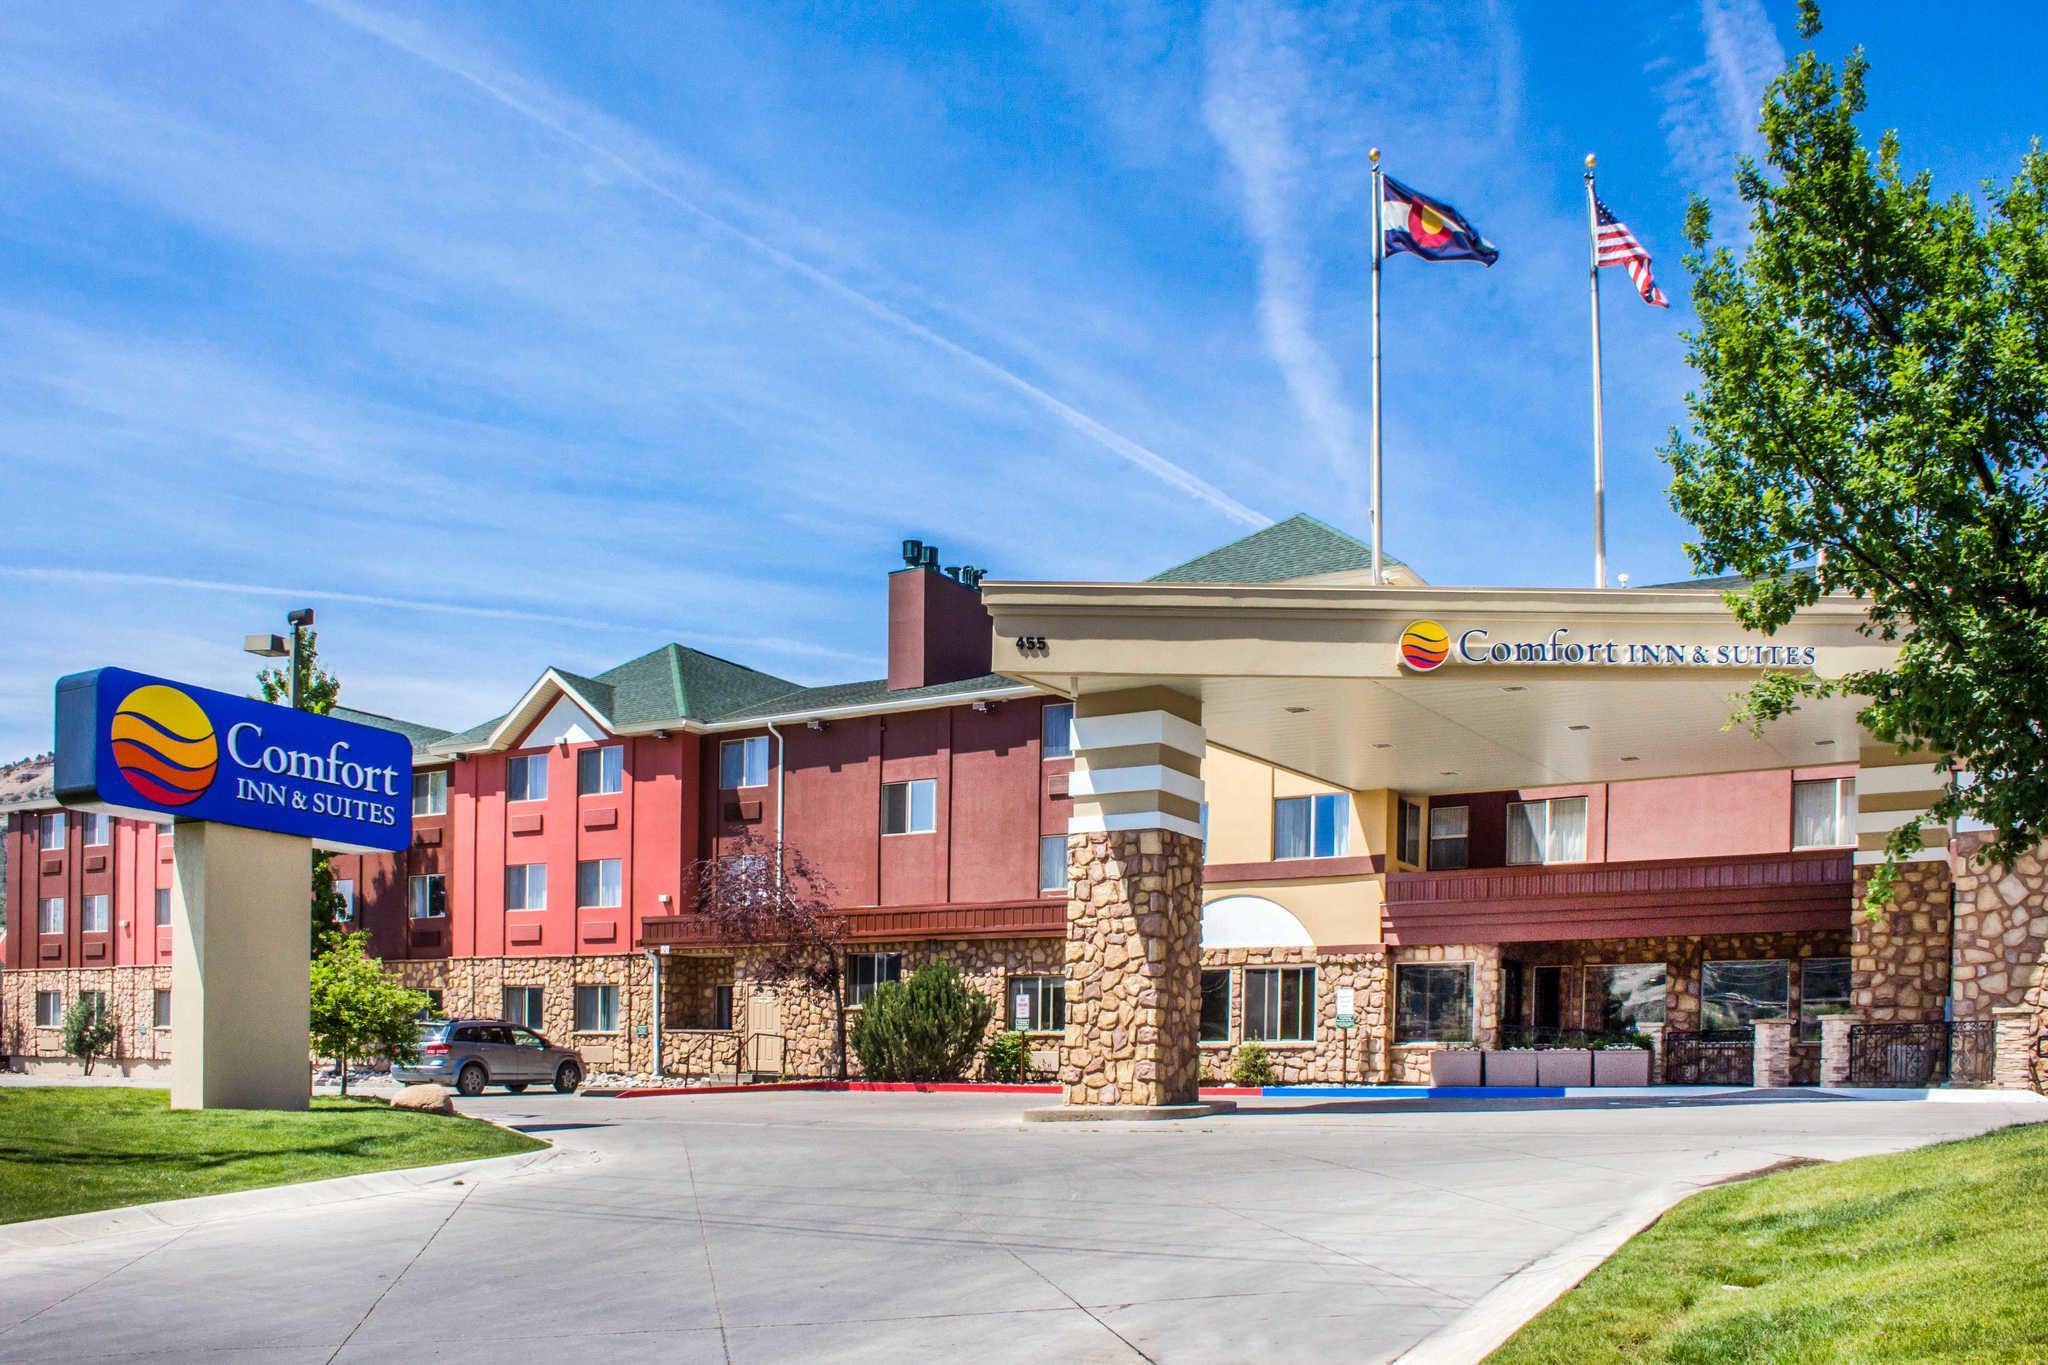 Durango Hotels And Motels